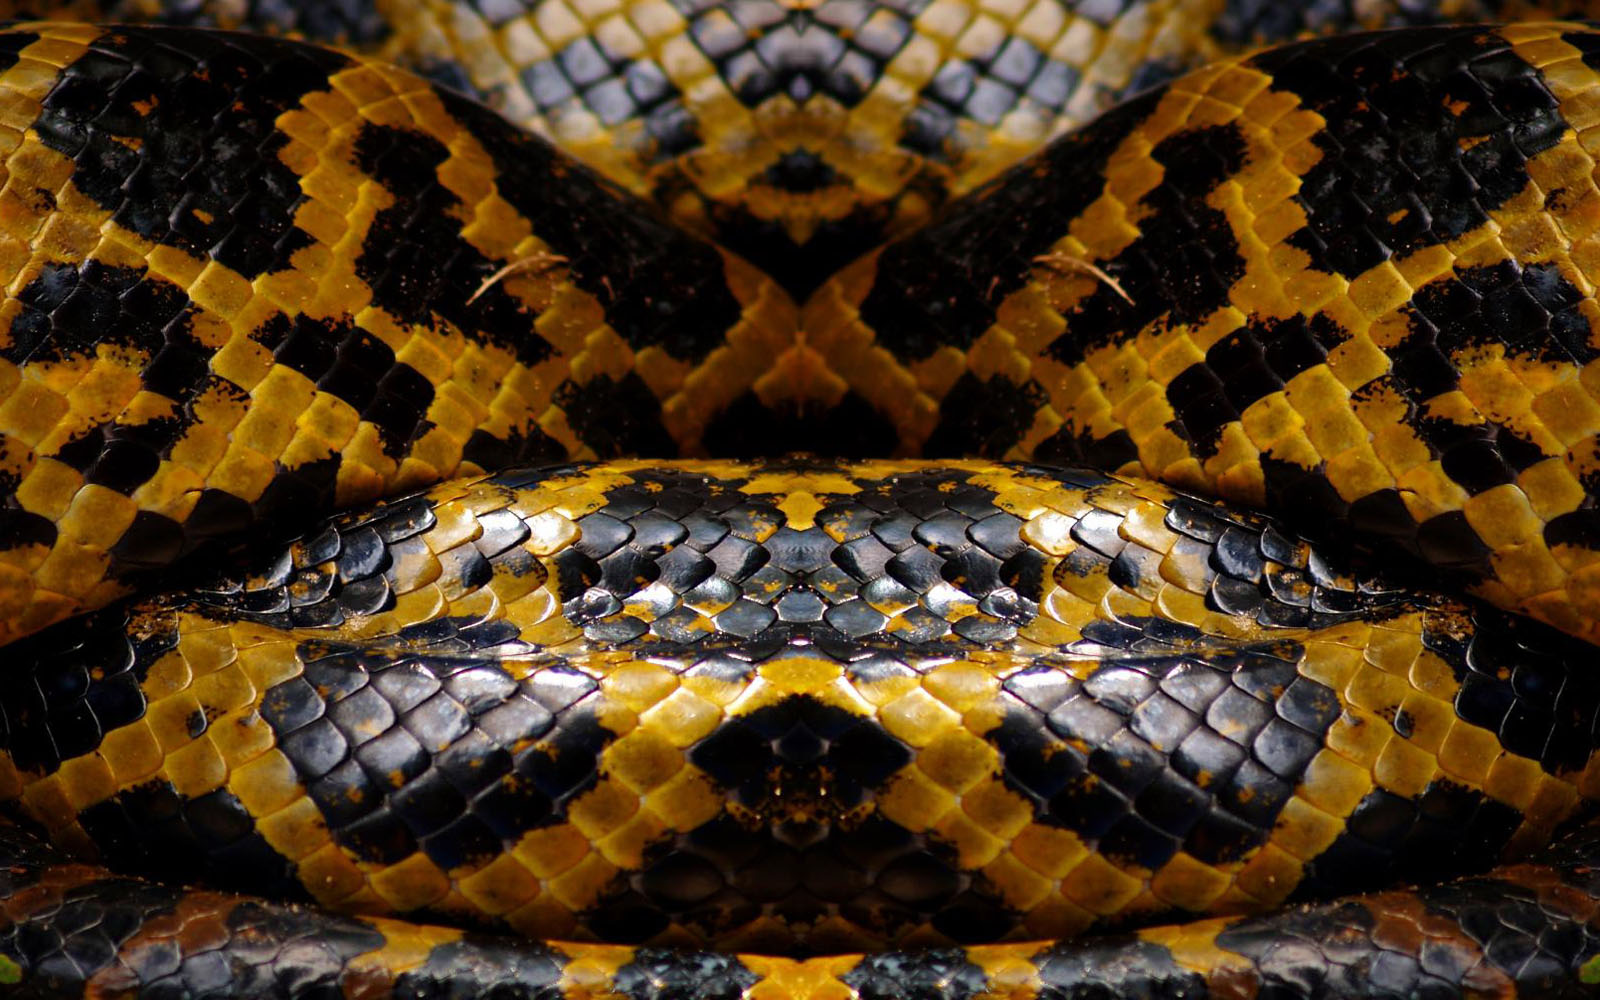 http://2.bp.blogspot.com/--E90VfMZ1bQ/T1yqTUiwlcI/AAAAAAAAA8Y/wx8IpCqcawE/s1600/Snake+Skin+Wallpapers+3.jpg